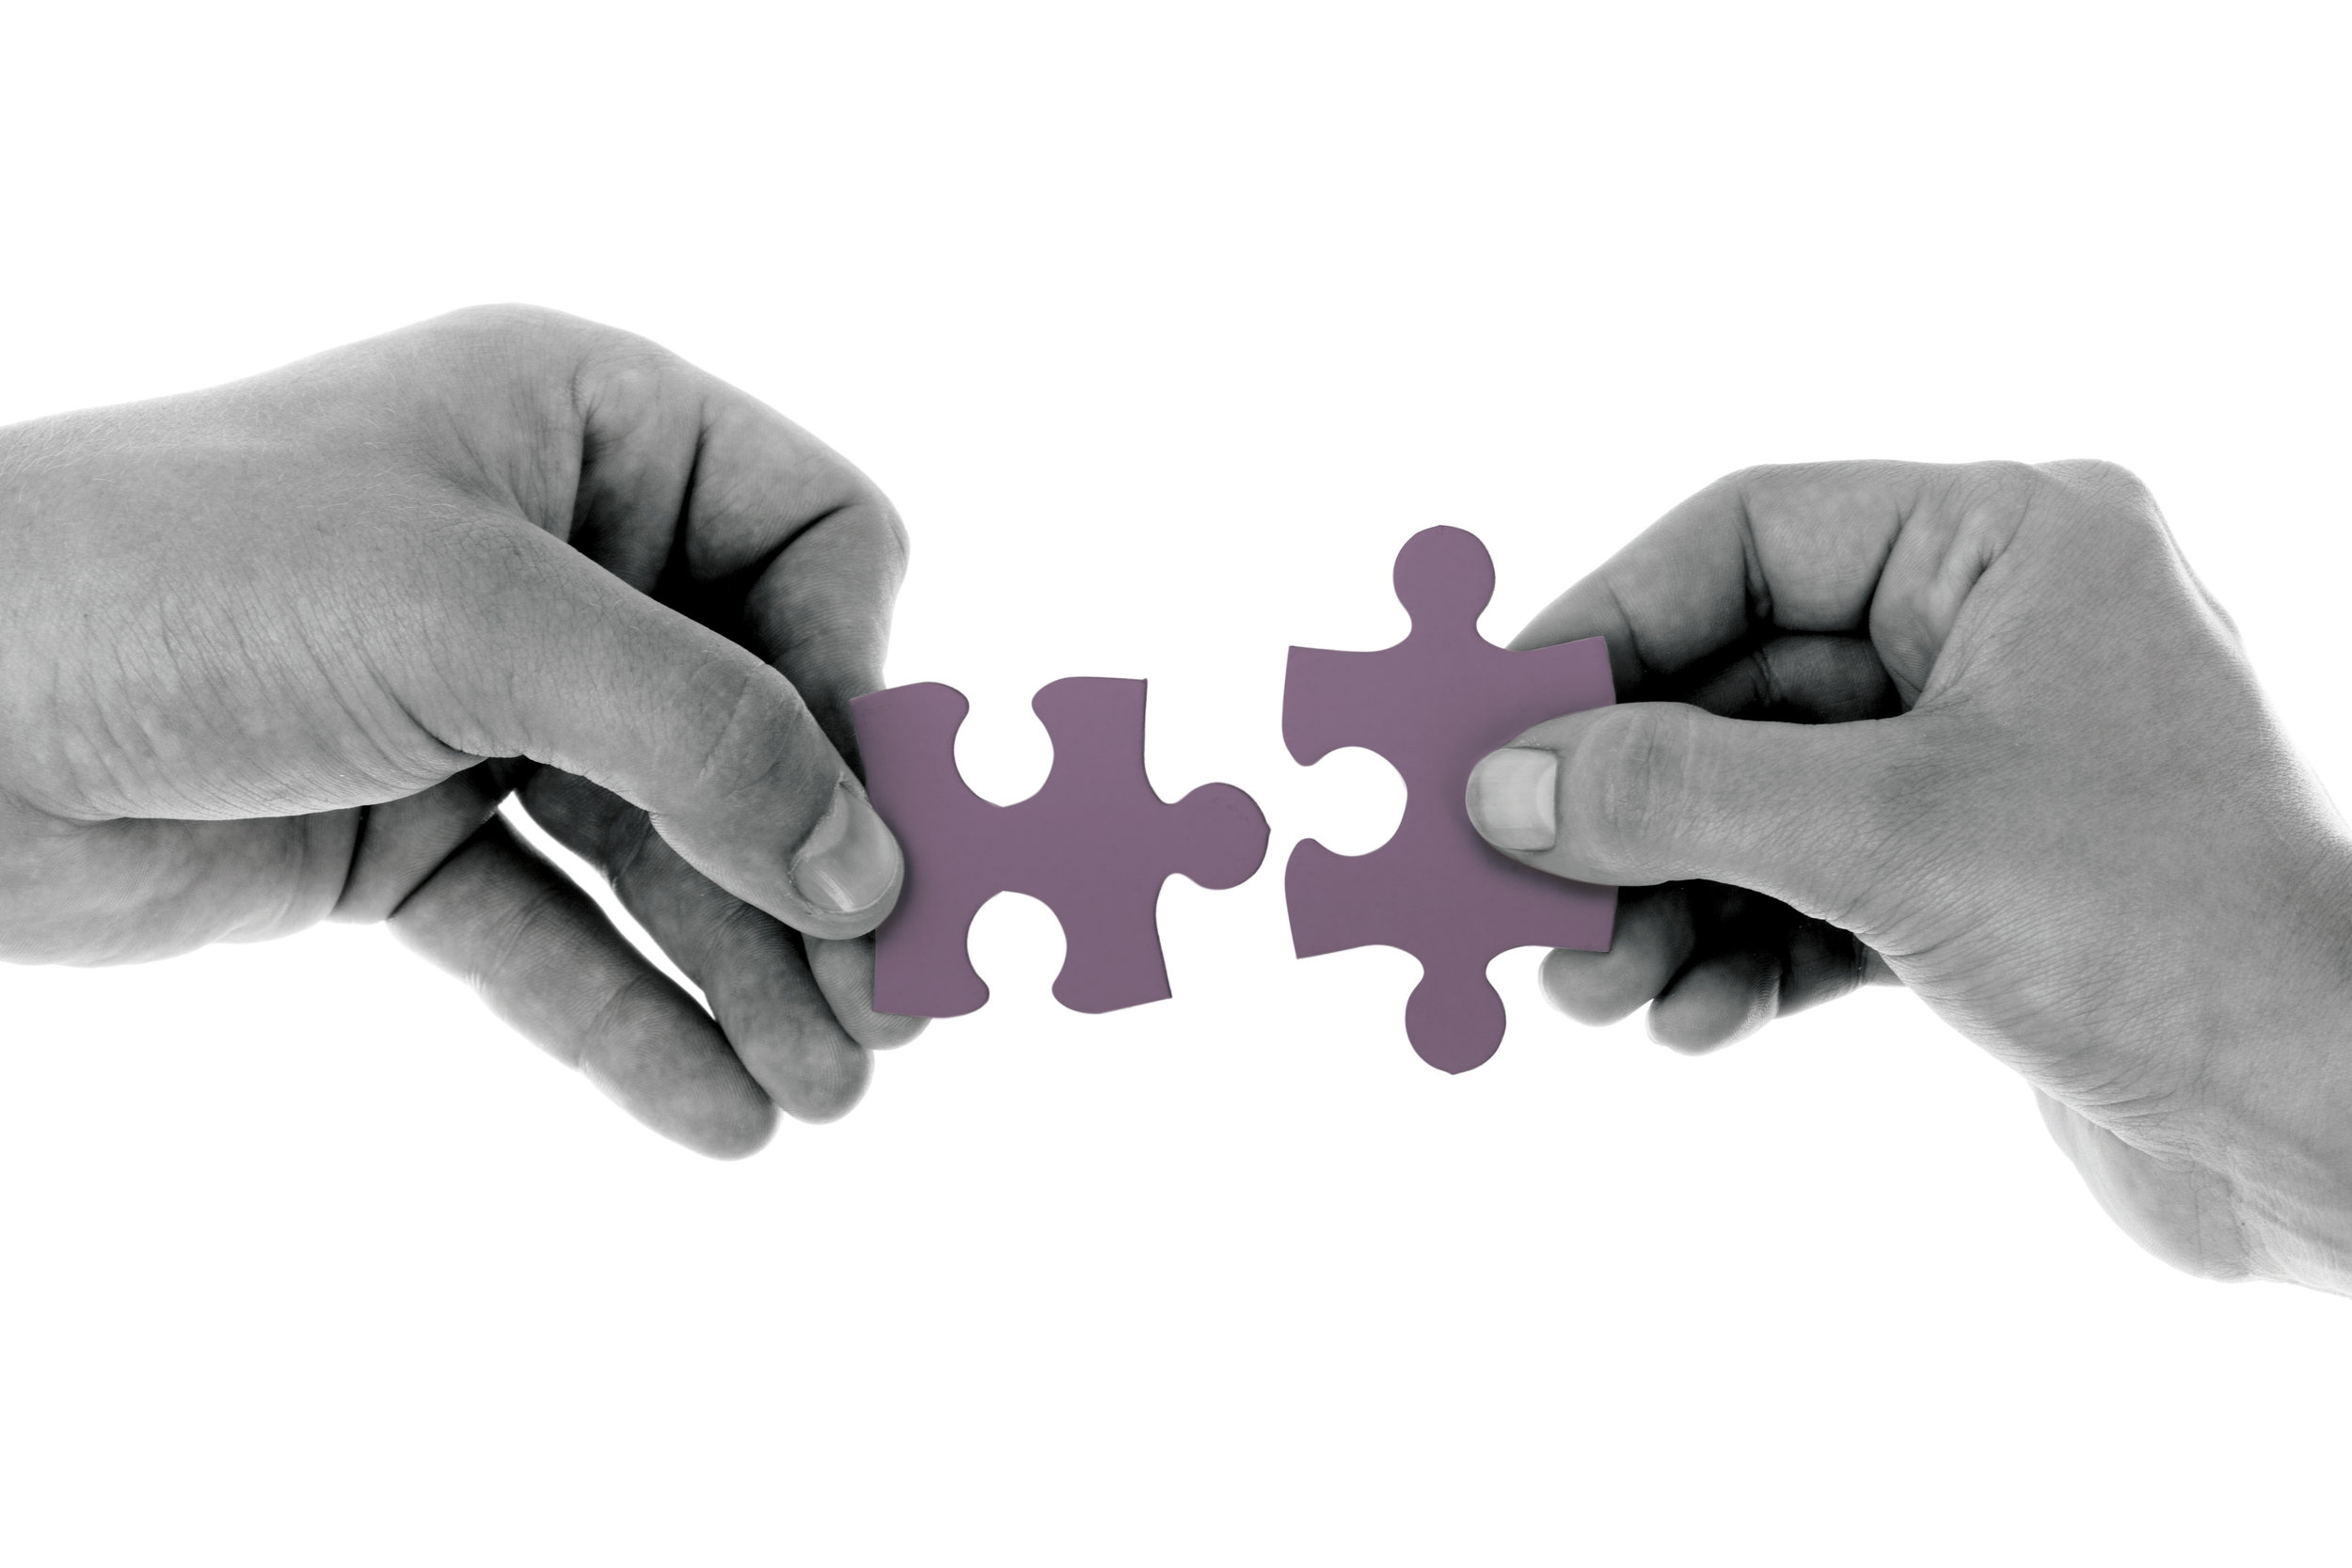 Canva - 2 Hands Holding 1 Jigsaw Puzzle Piece Each.jpg